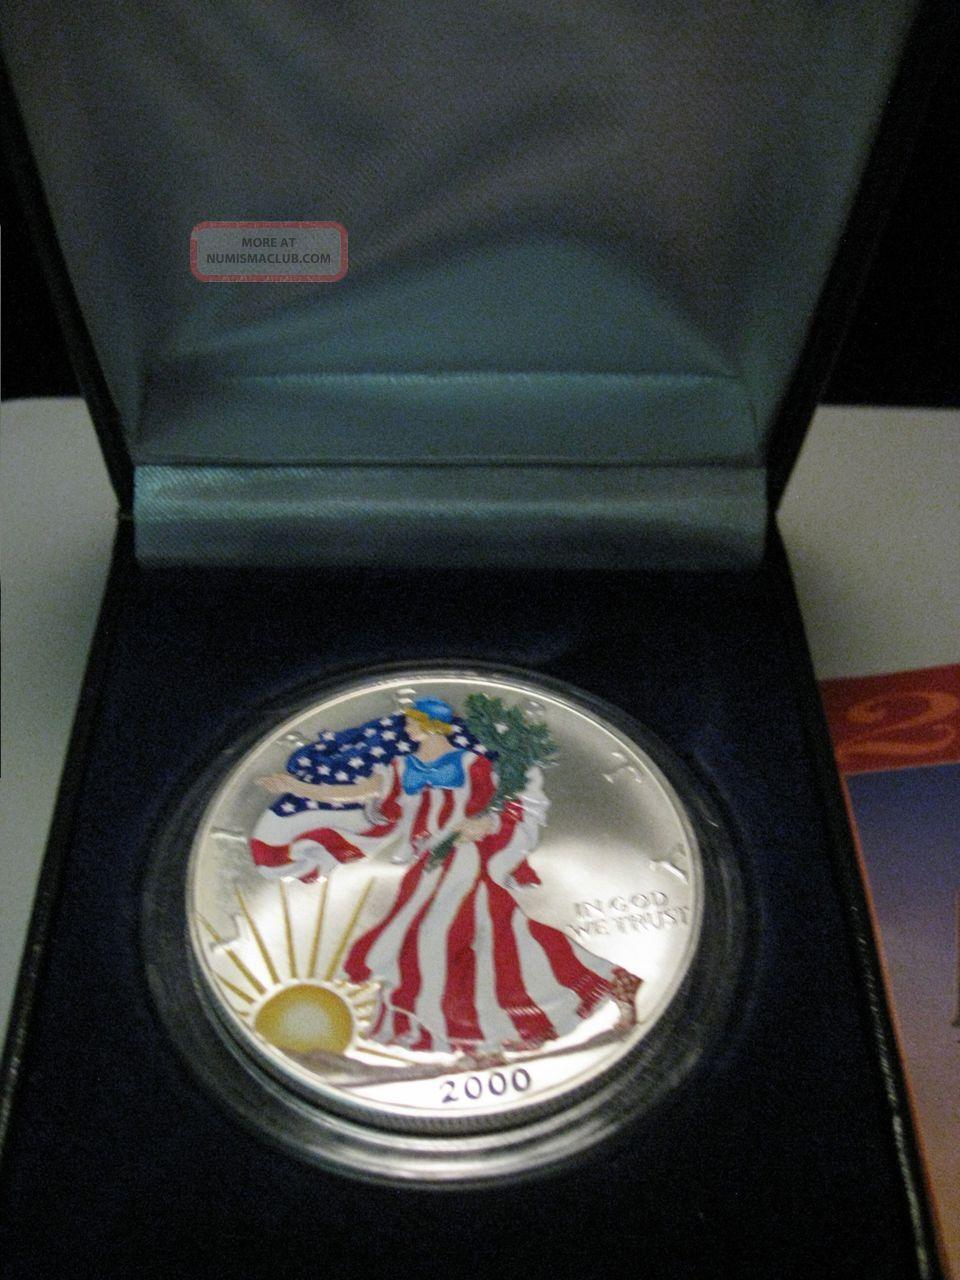 2000 Colorized Us American Eagle 1 Troy Oz Fine Silver